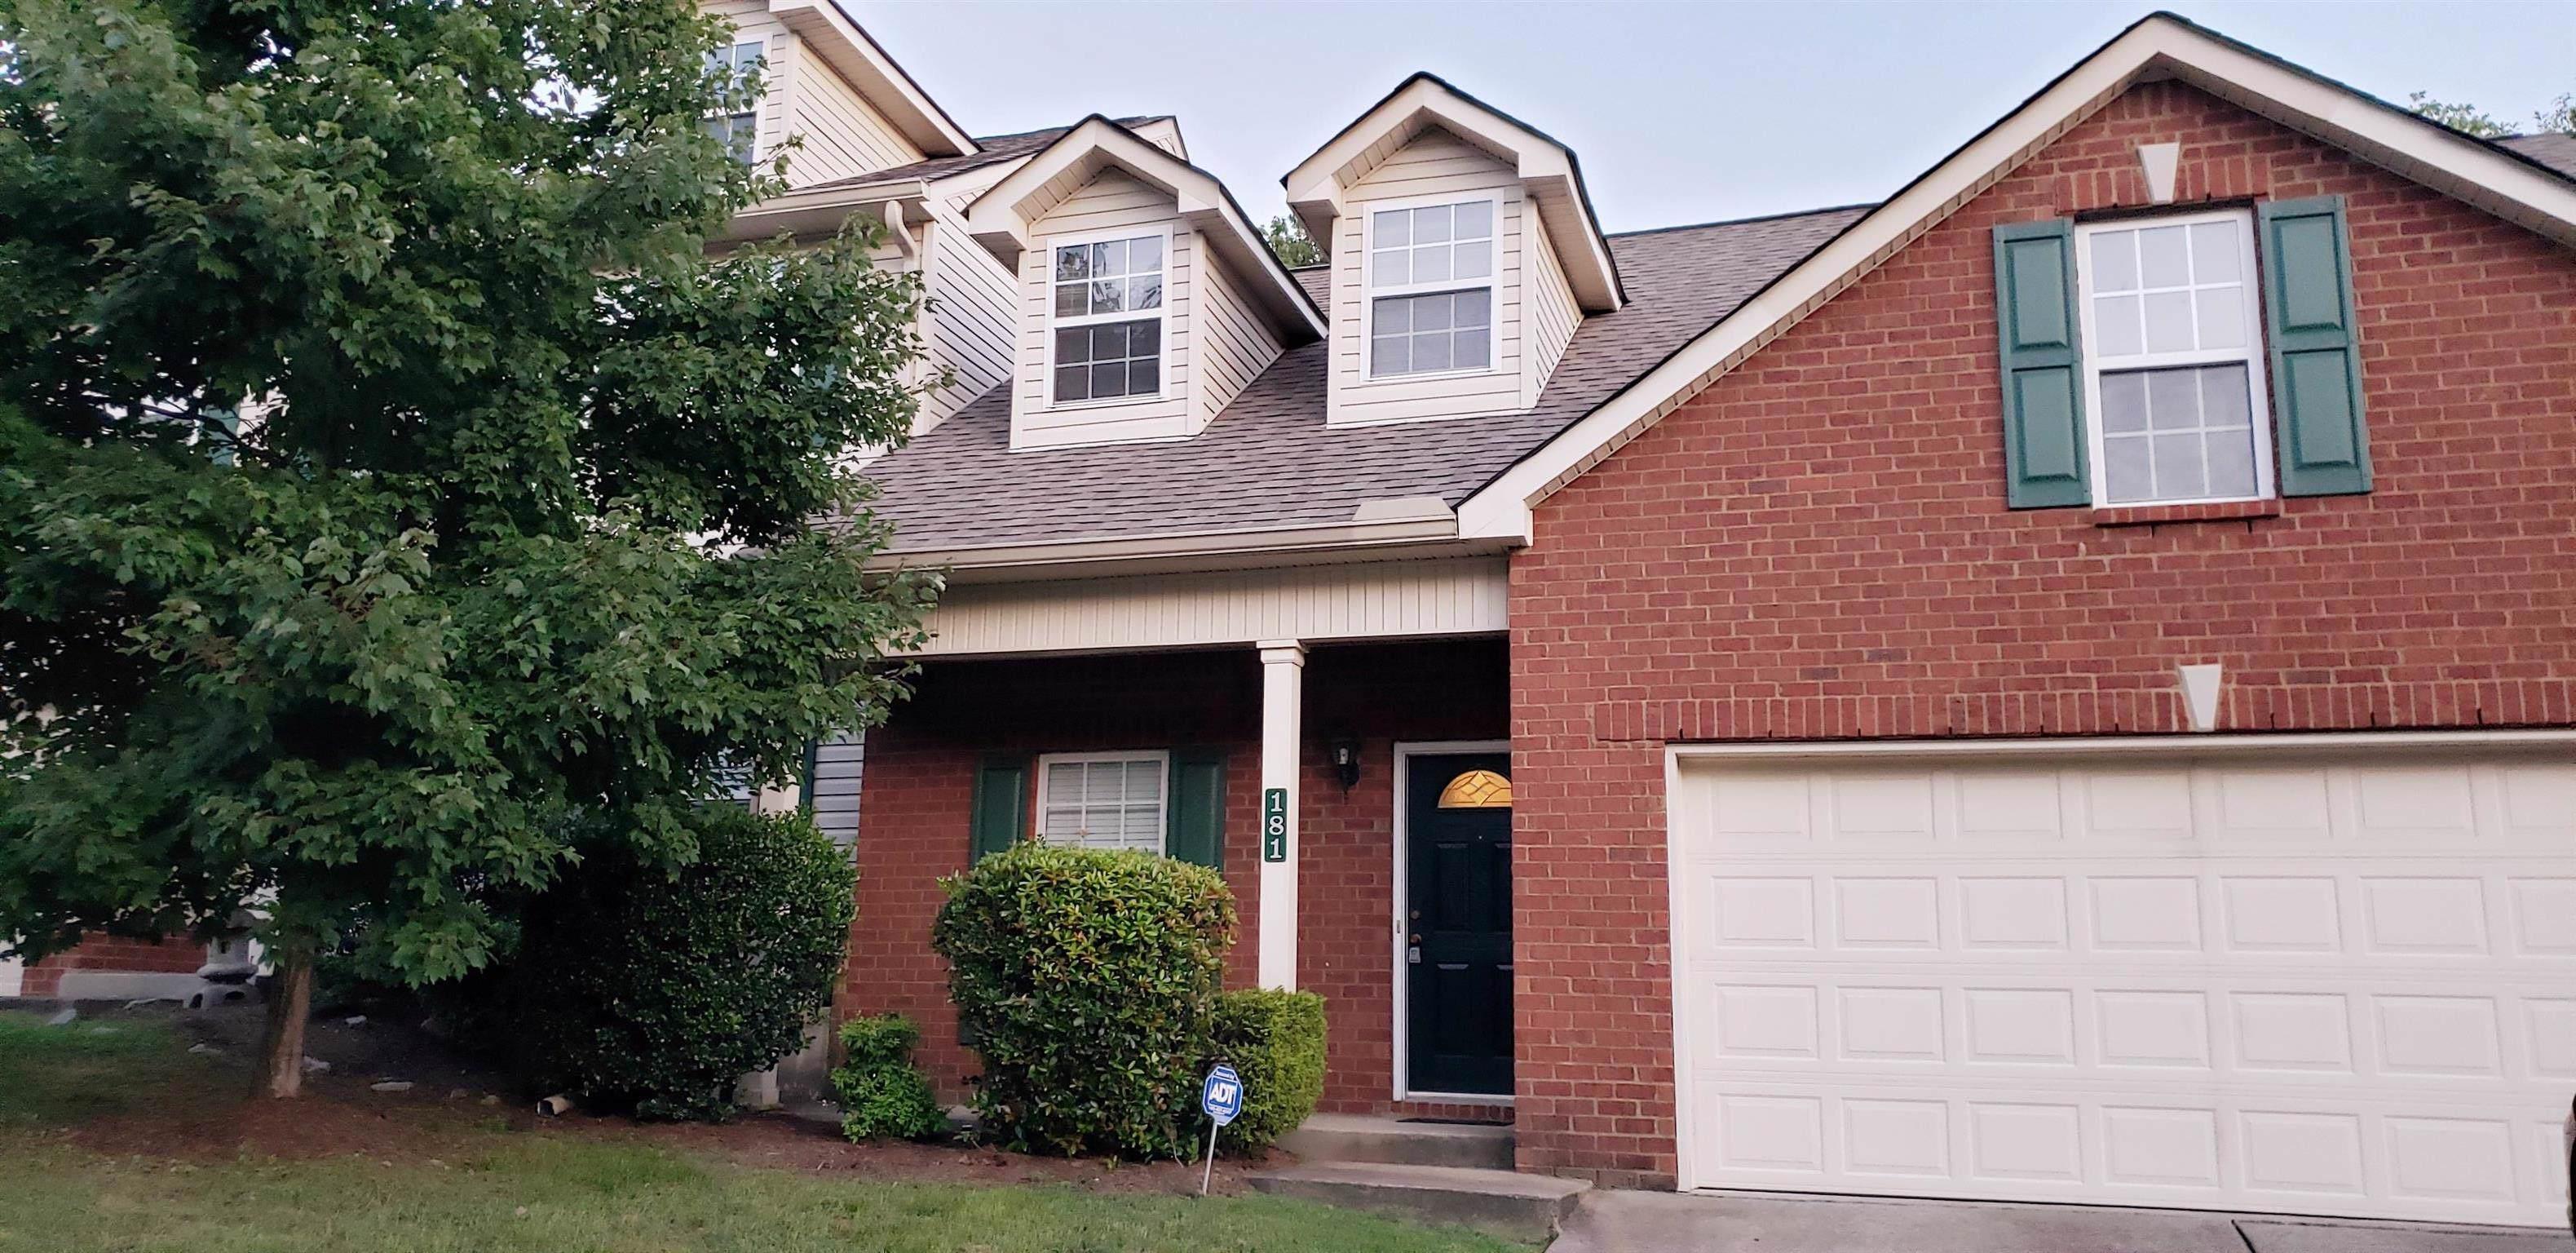 181 Nashboro Grns #181, Nashville, TN 37217 (MLS #RTC2063328) :: RE/MAX Homes And Estates